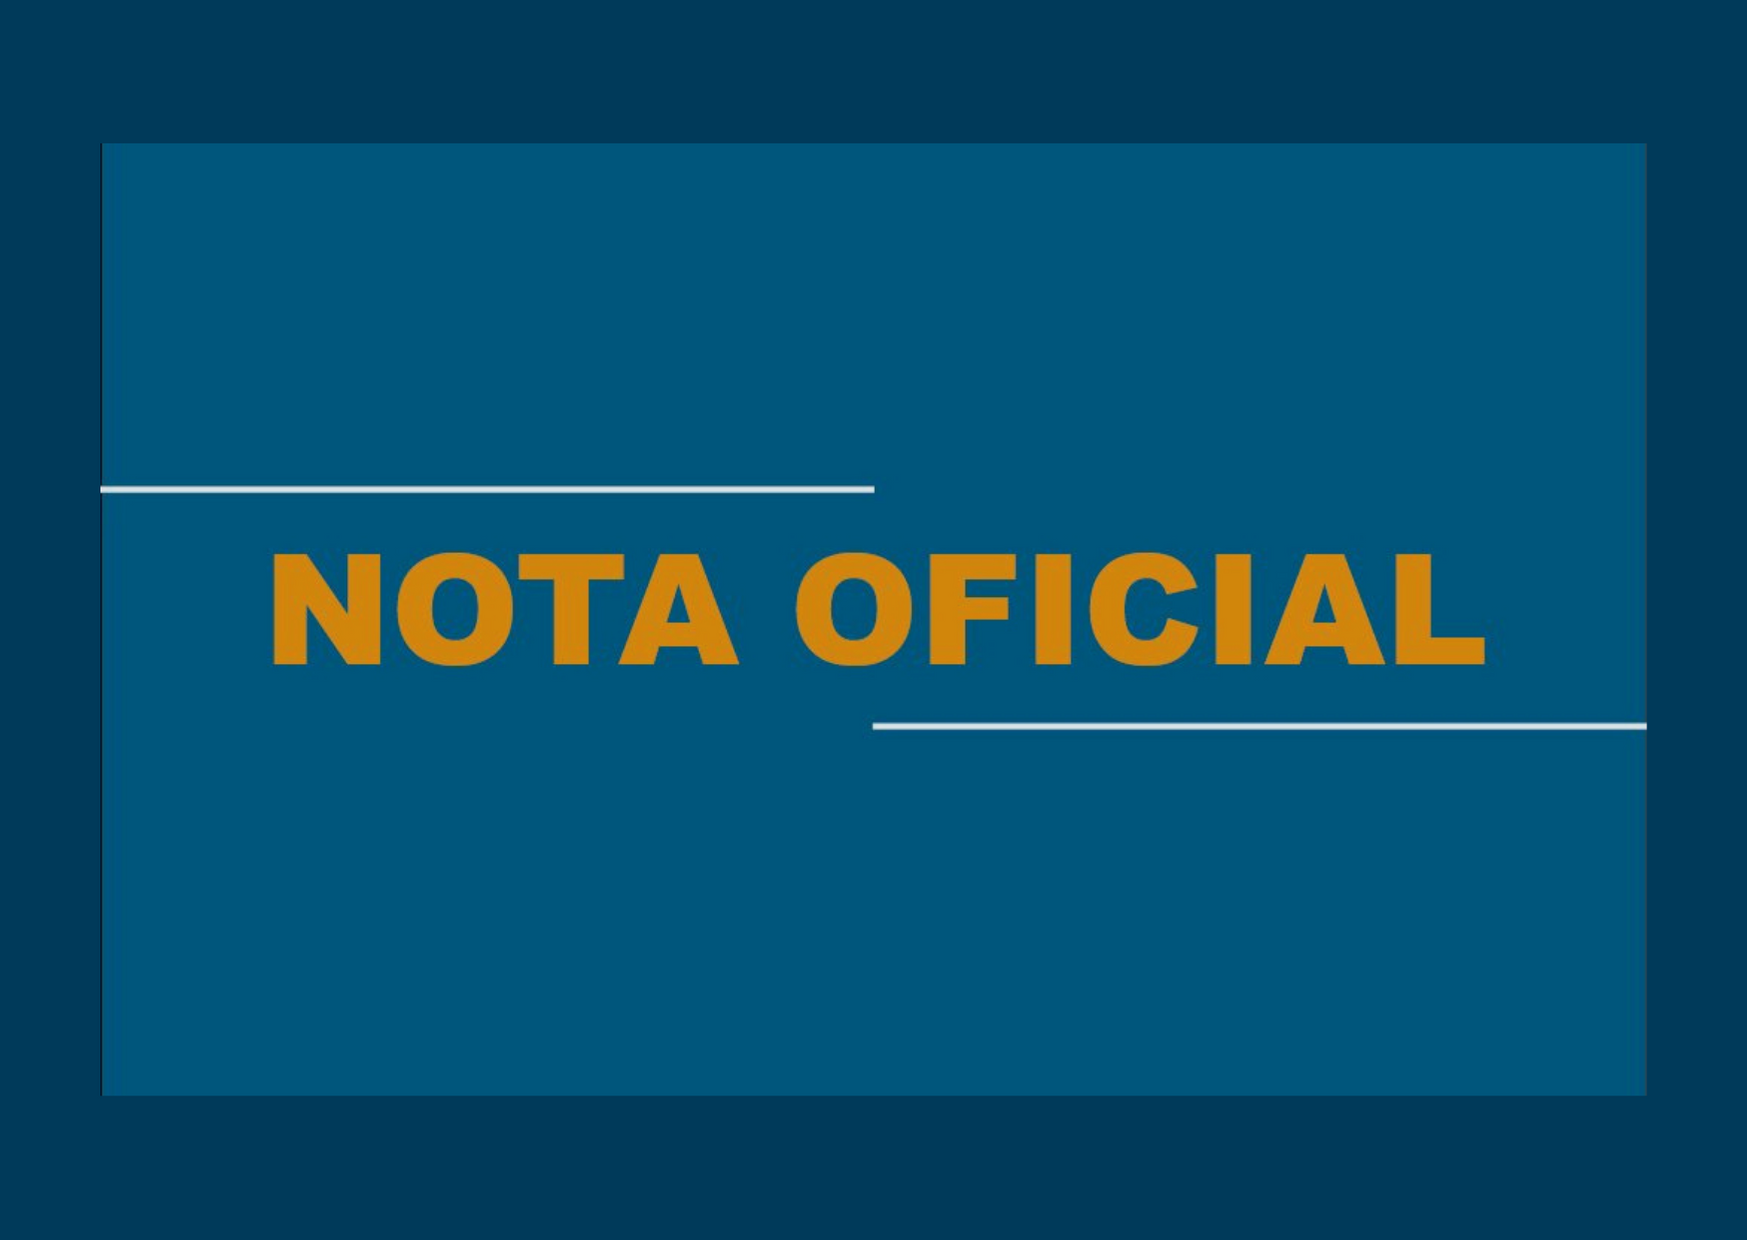 NOTA OFICIAL - CONCURSO PÚBLICO